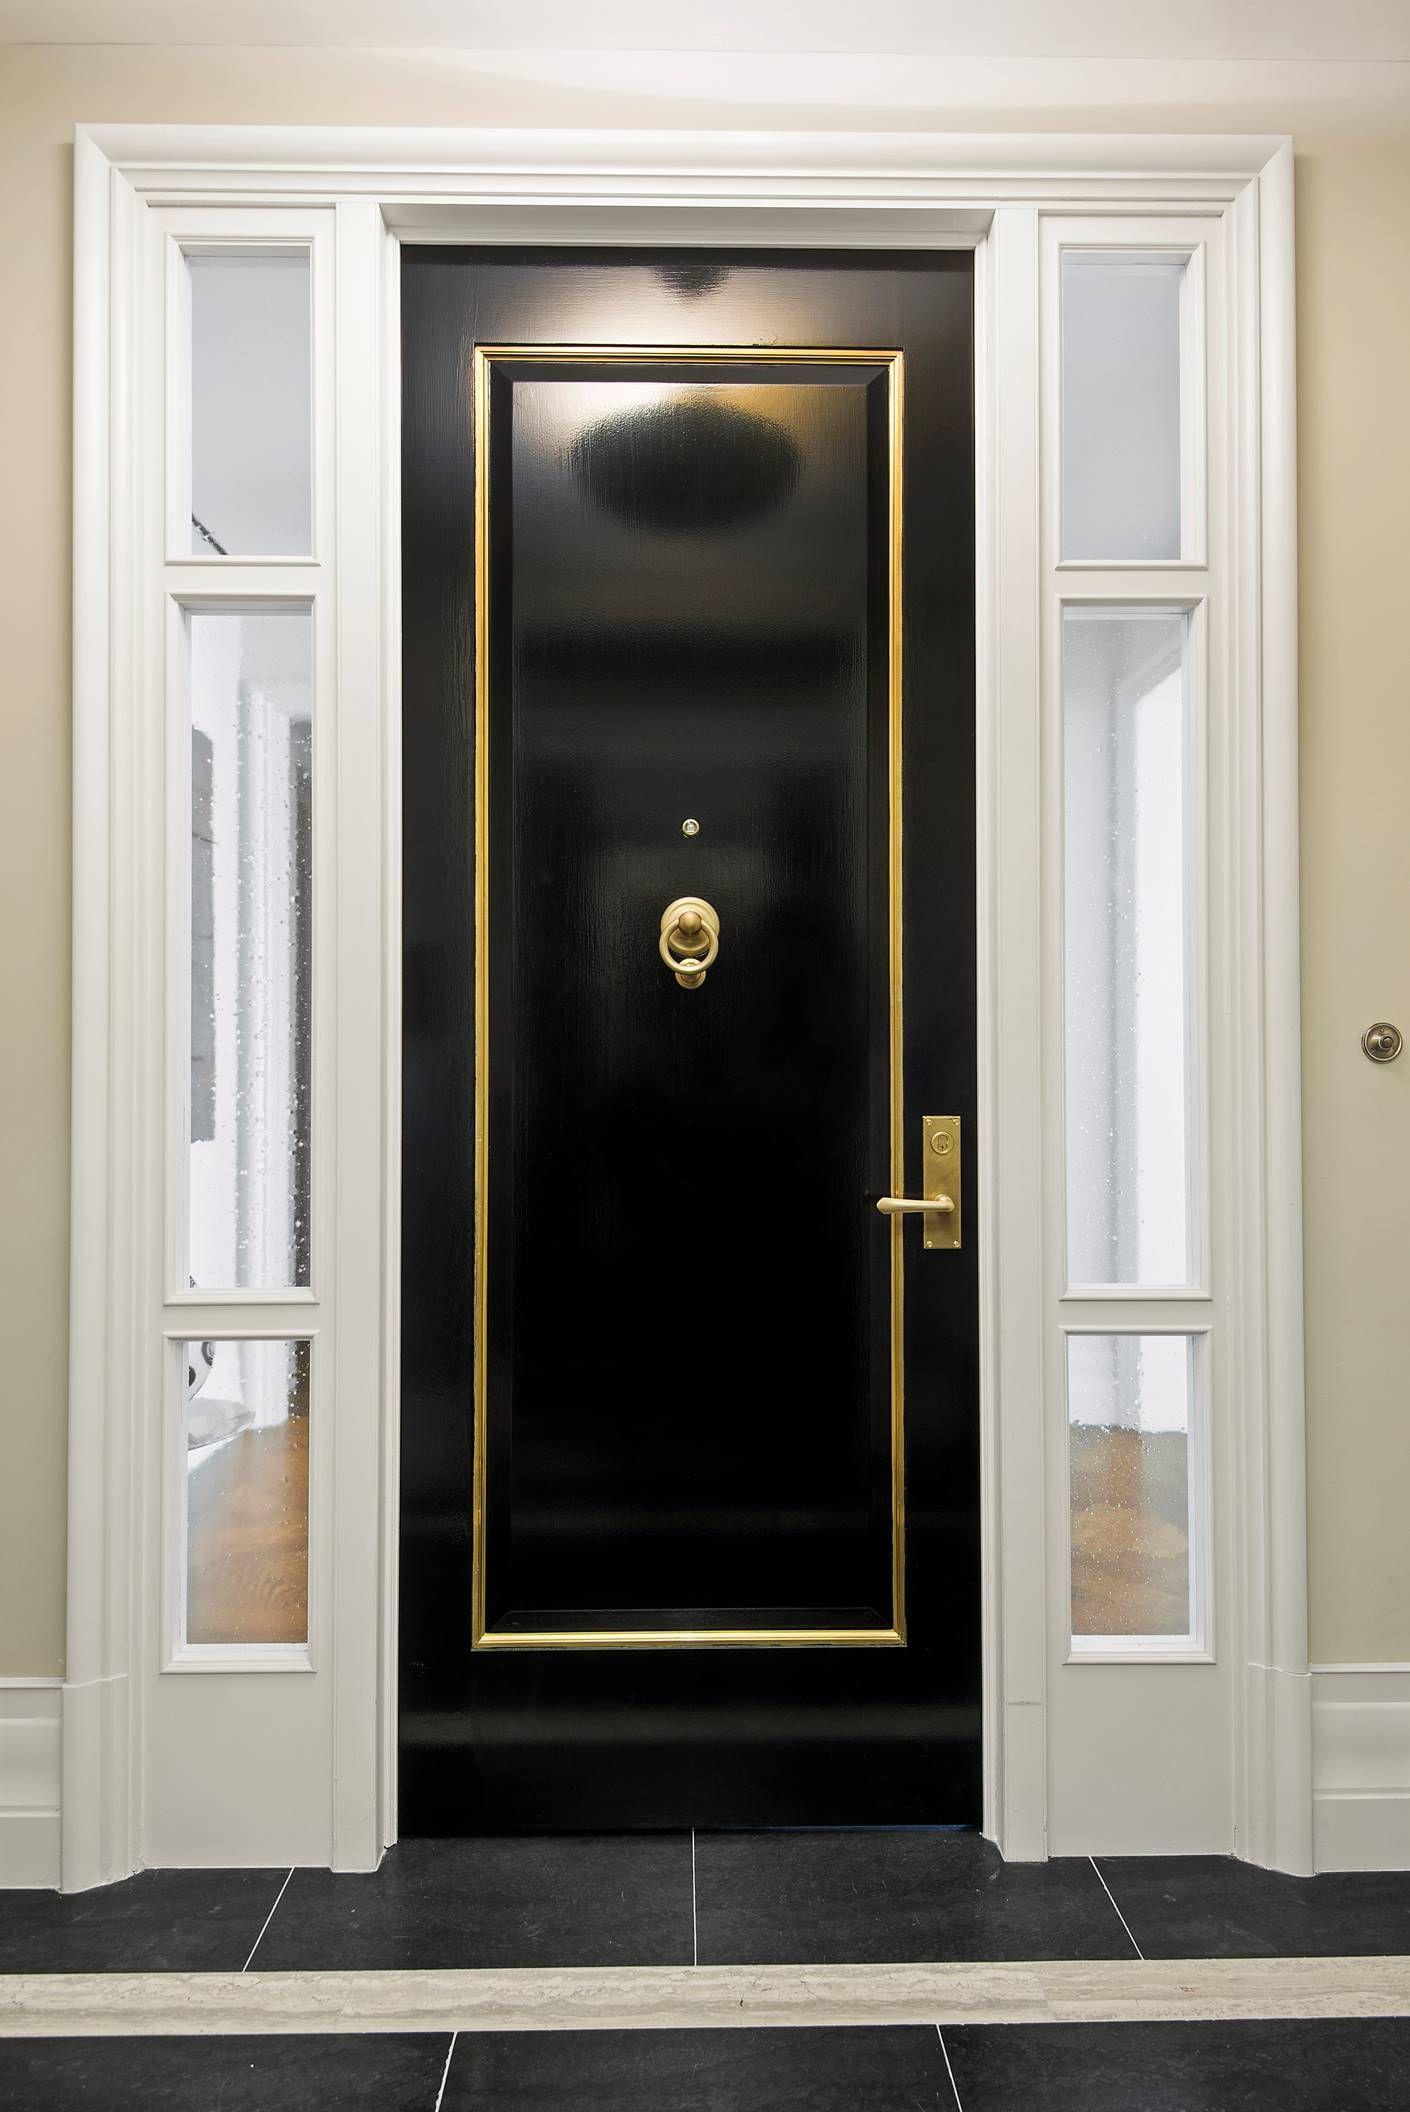 Supa Doors – Stile & Rail Interior MDF Paneled, Fire Rated, Louvered ...